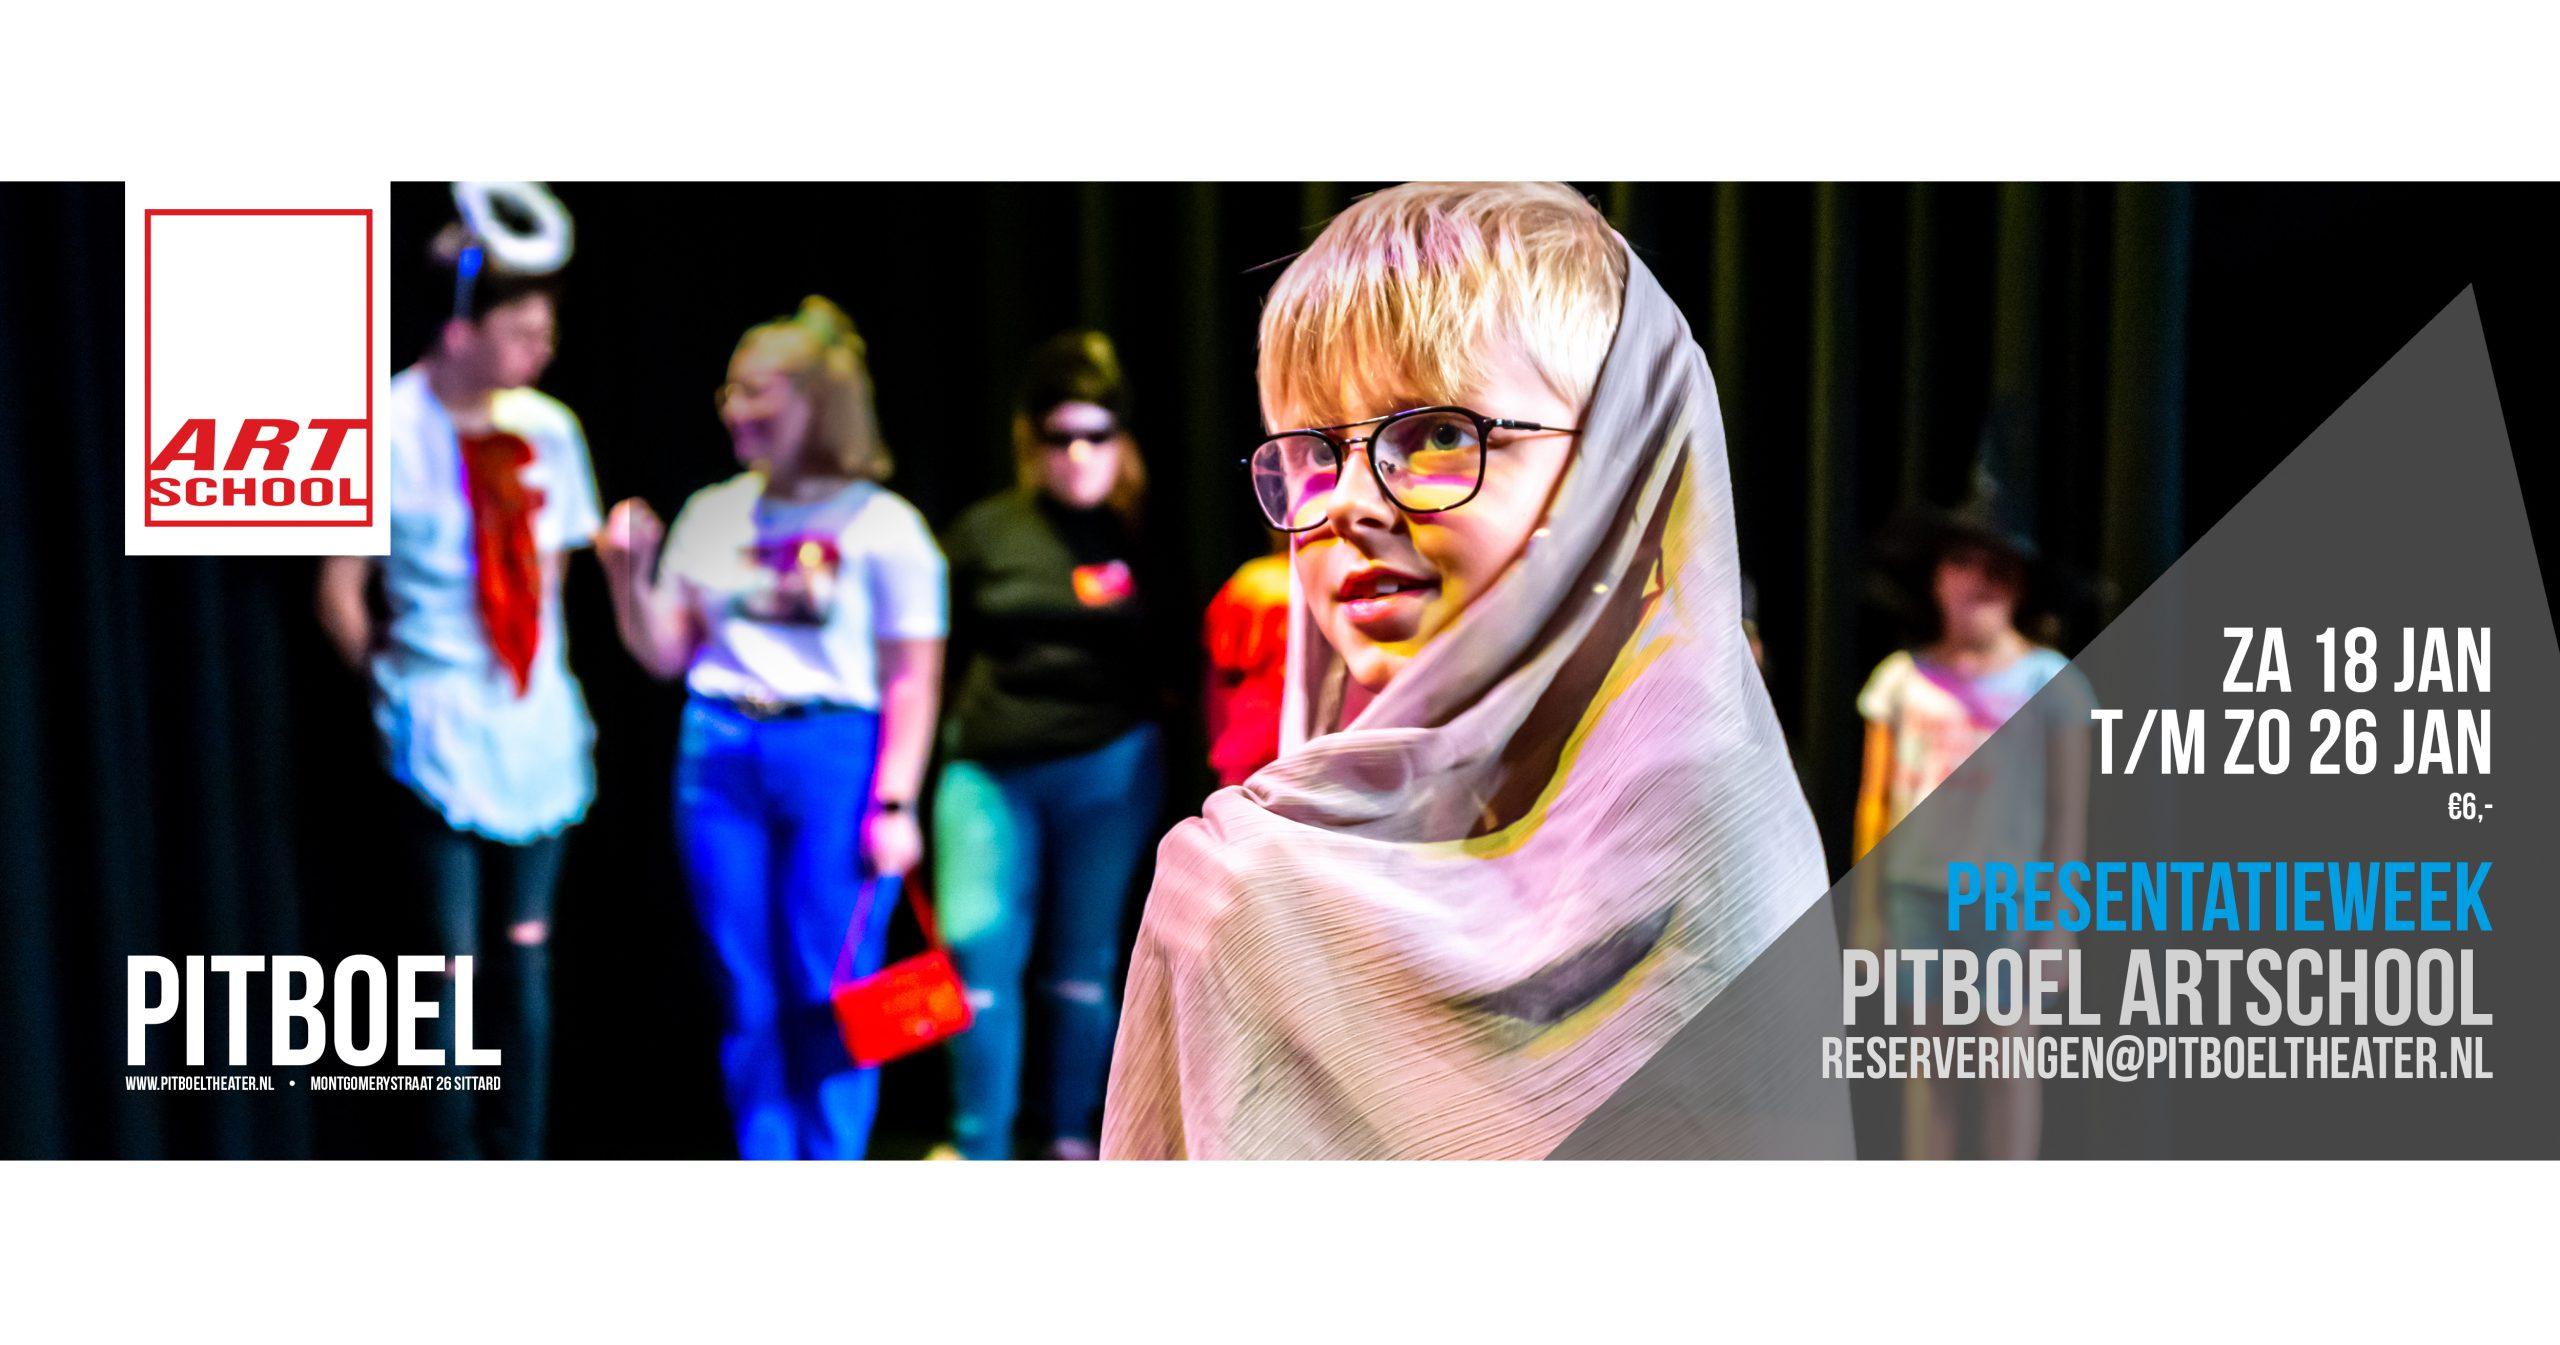 Pitboel Art School presentatieweek januari 2020